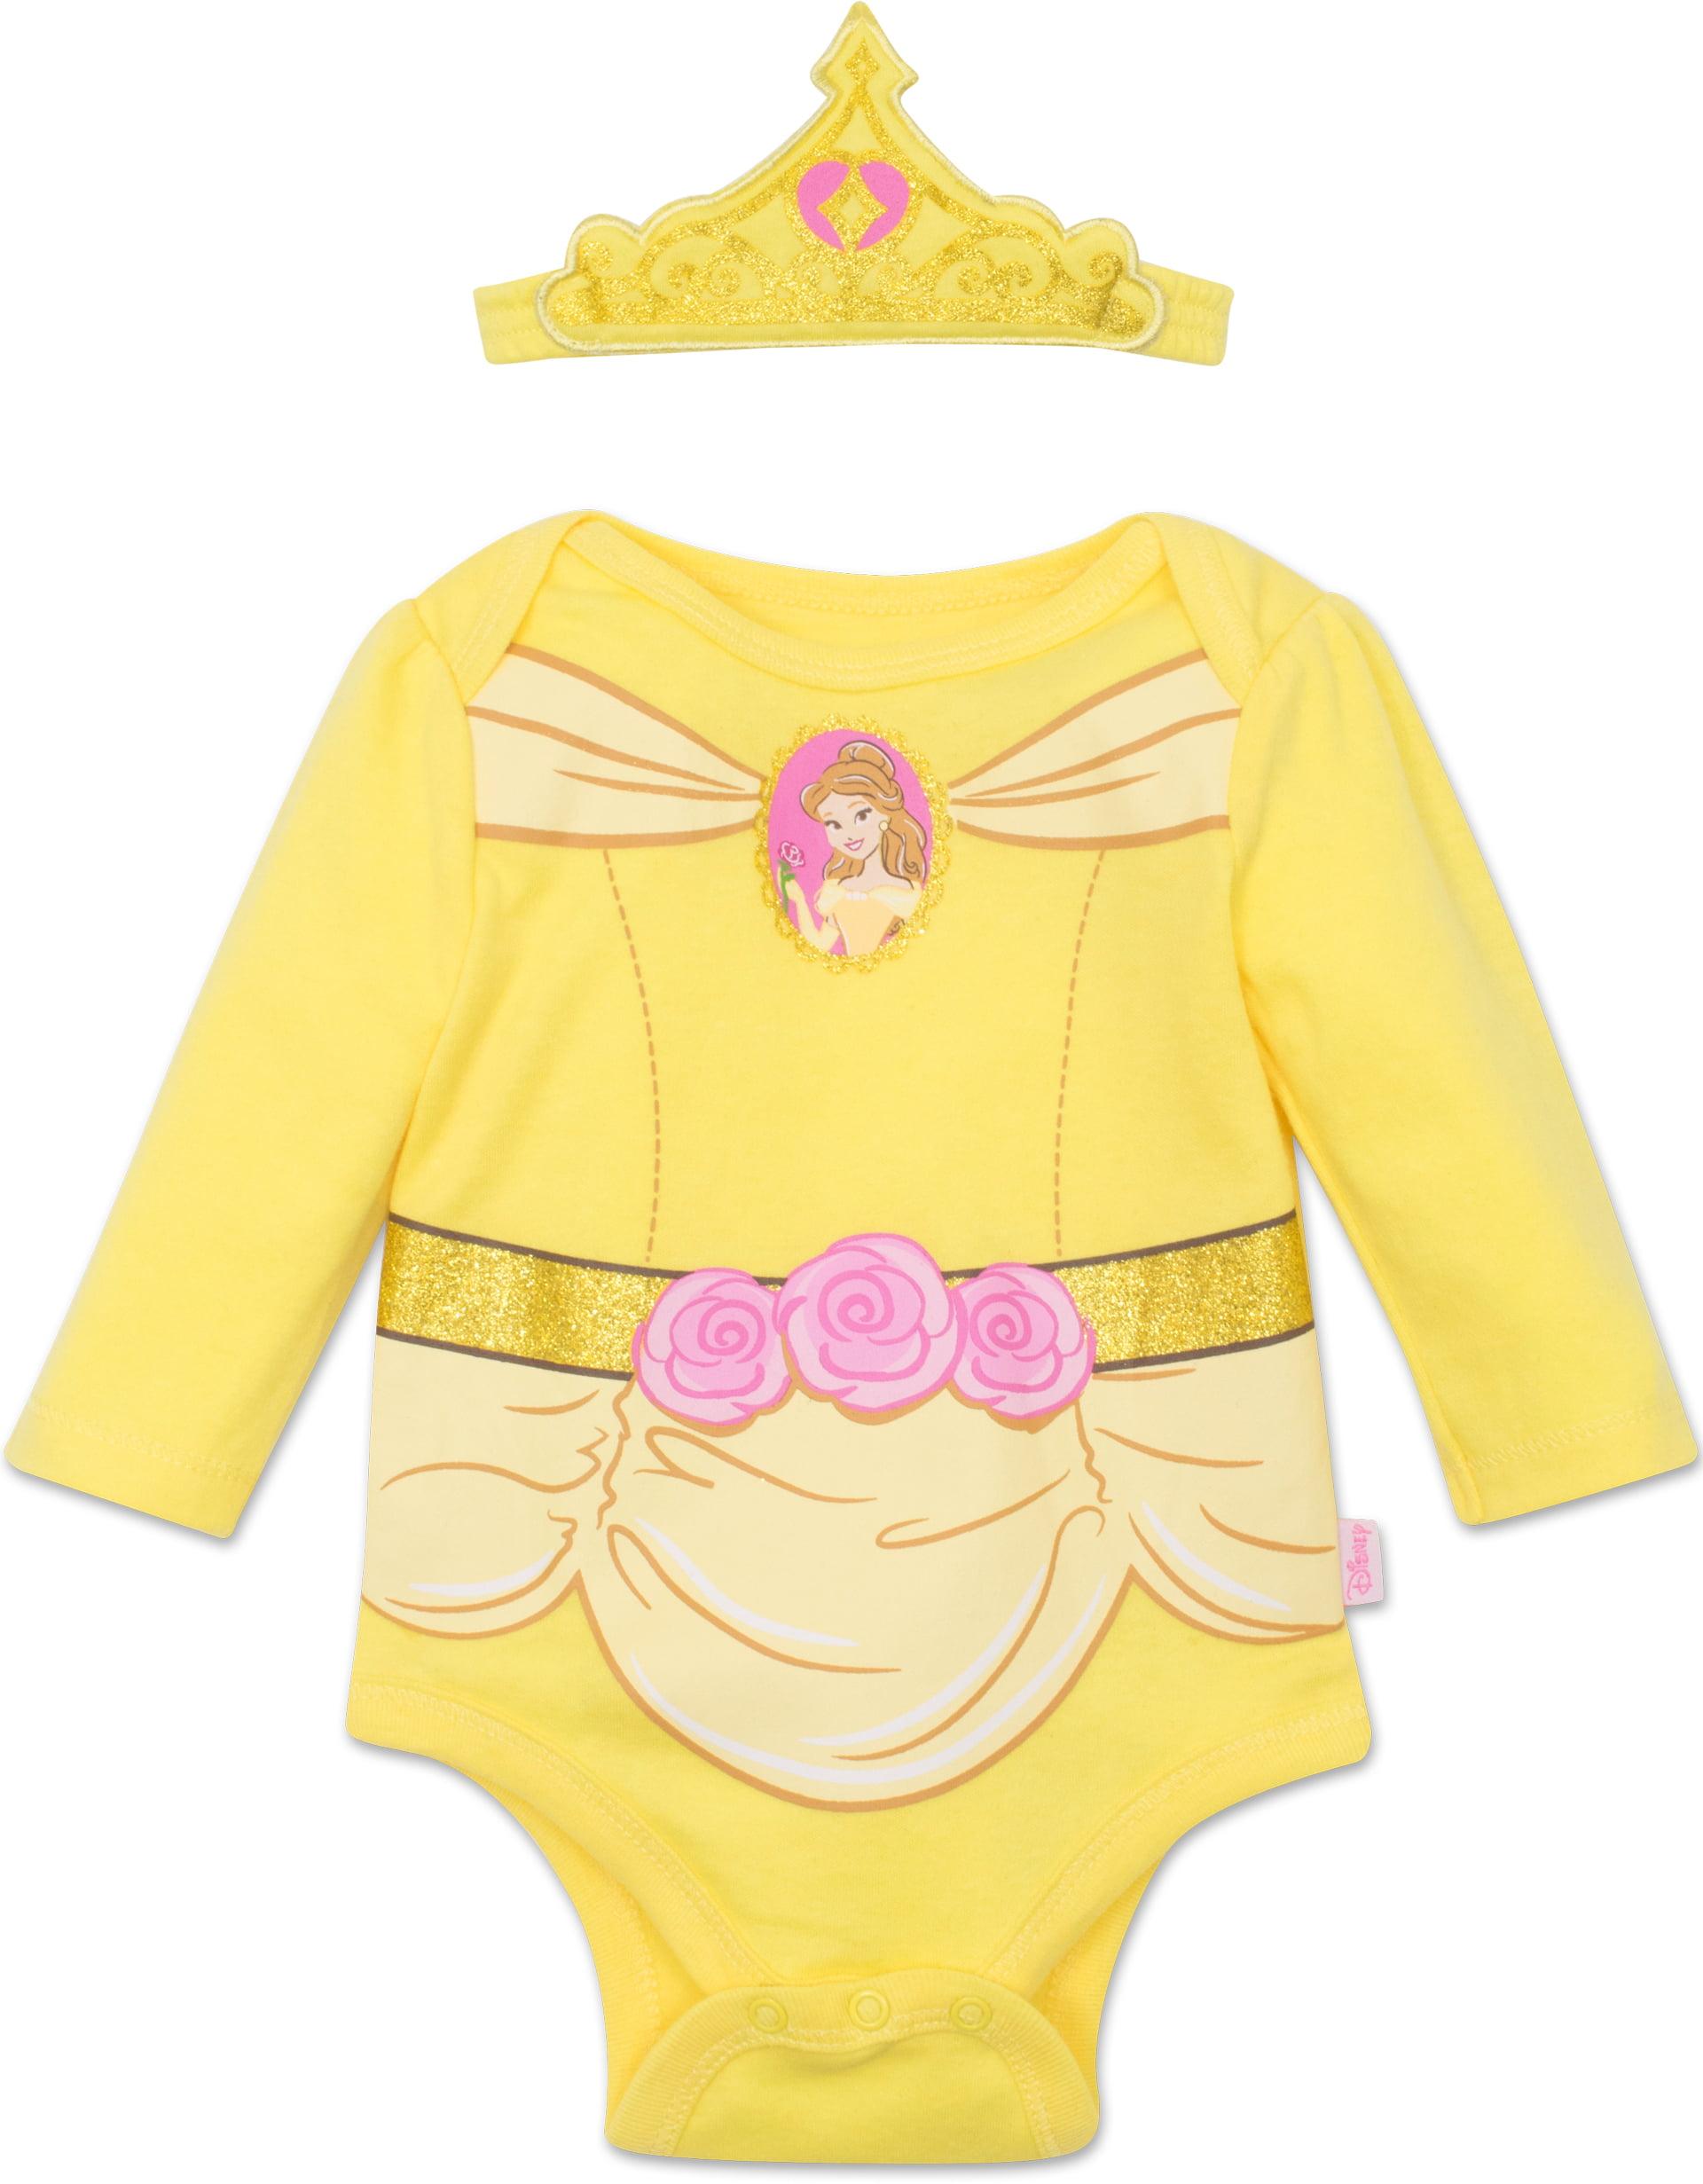 9000a0d85 Disney - Disney Princess Belle Baby Girls' Costume Long Sleeve Bodysuit and  Tiara Headband Yellow, 3-6 Months - Walmart.com